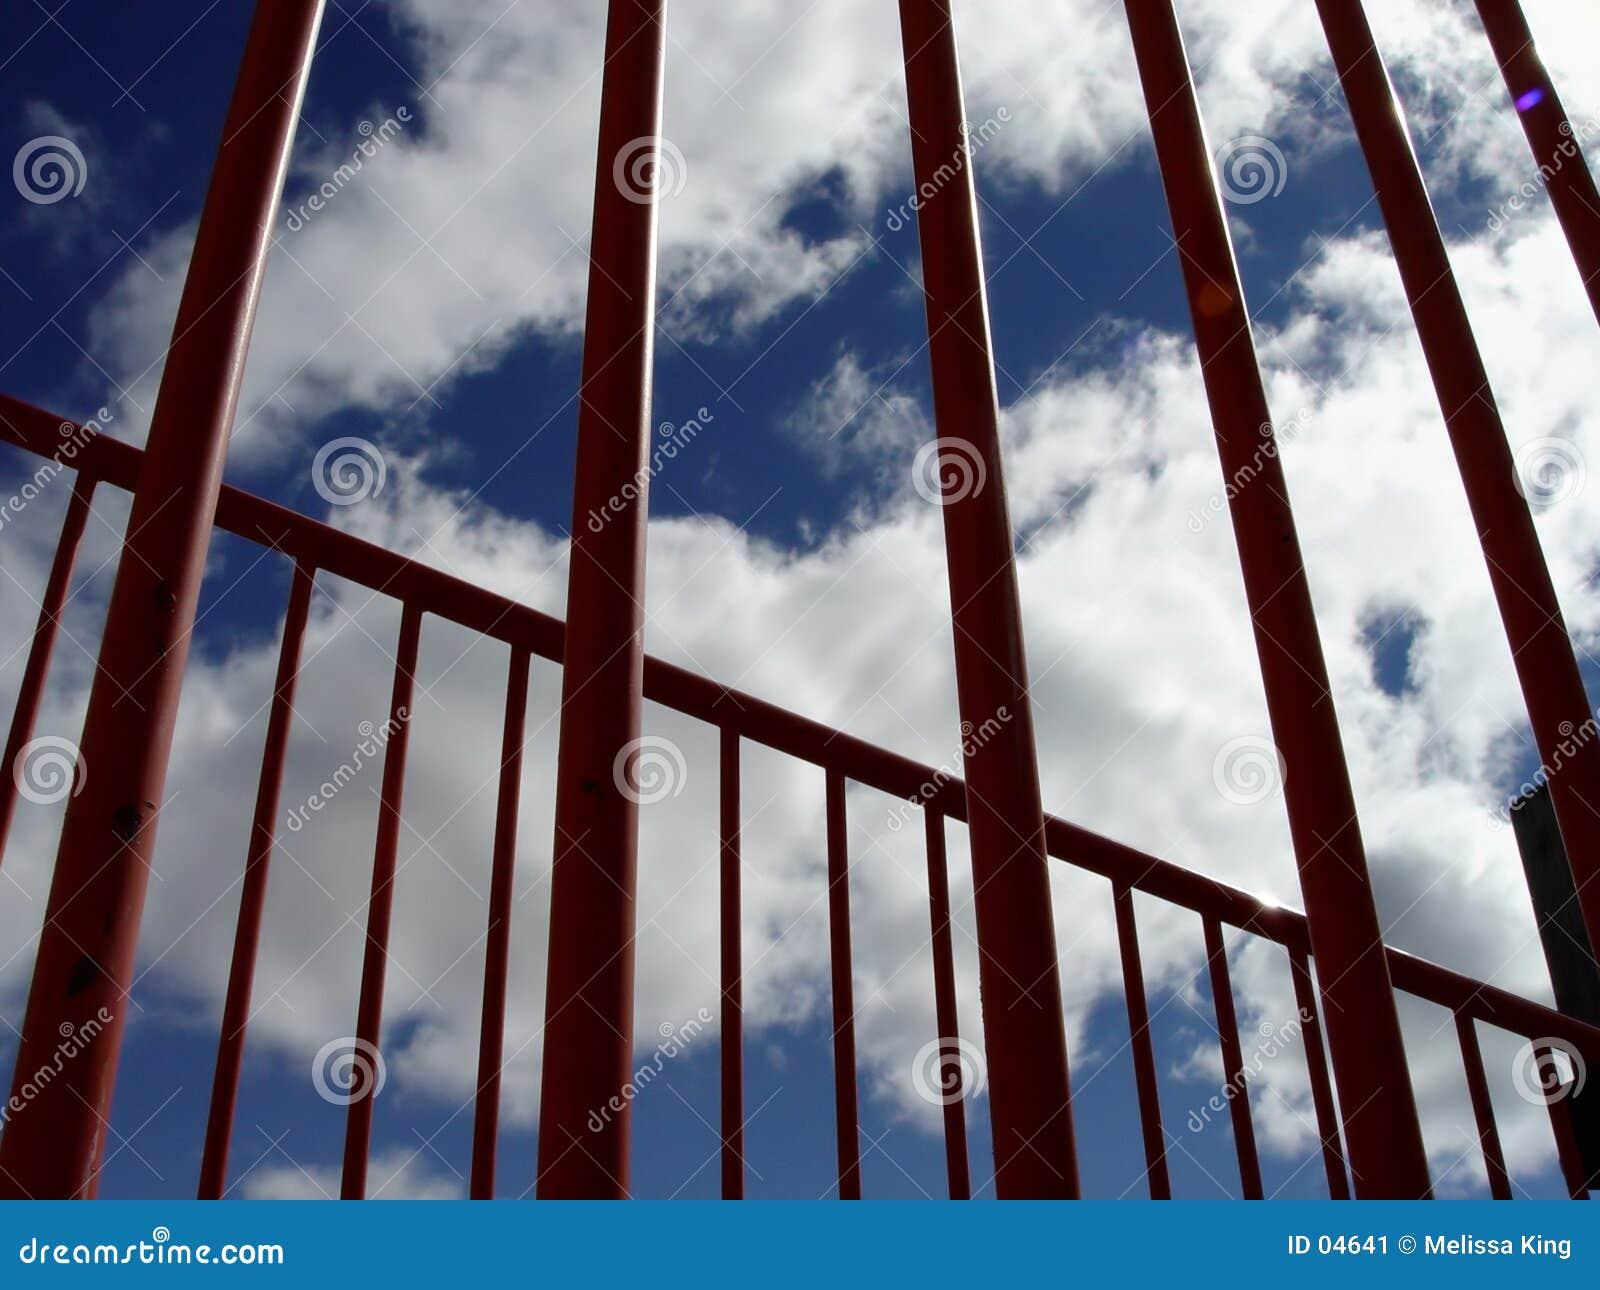 Bars skyen though